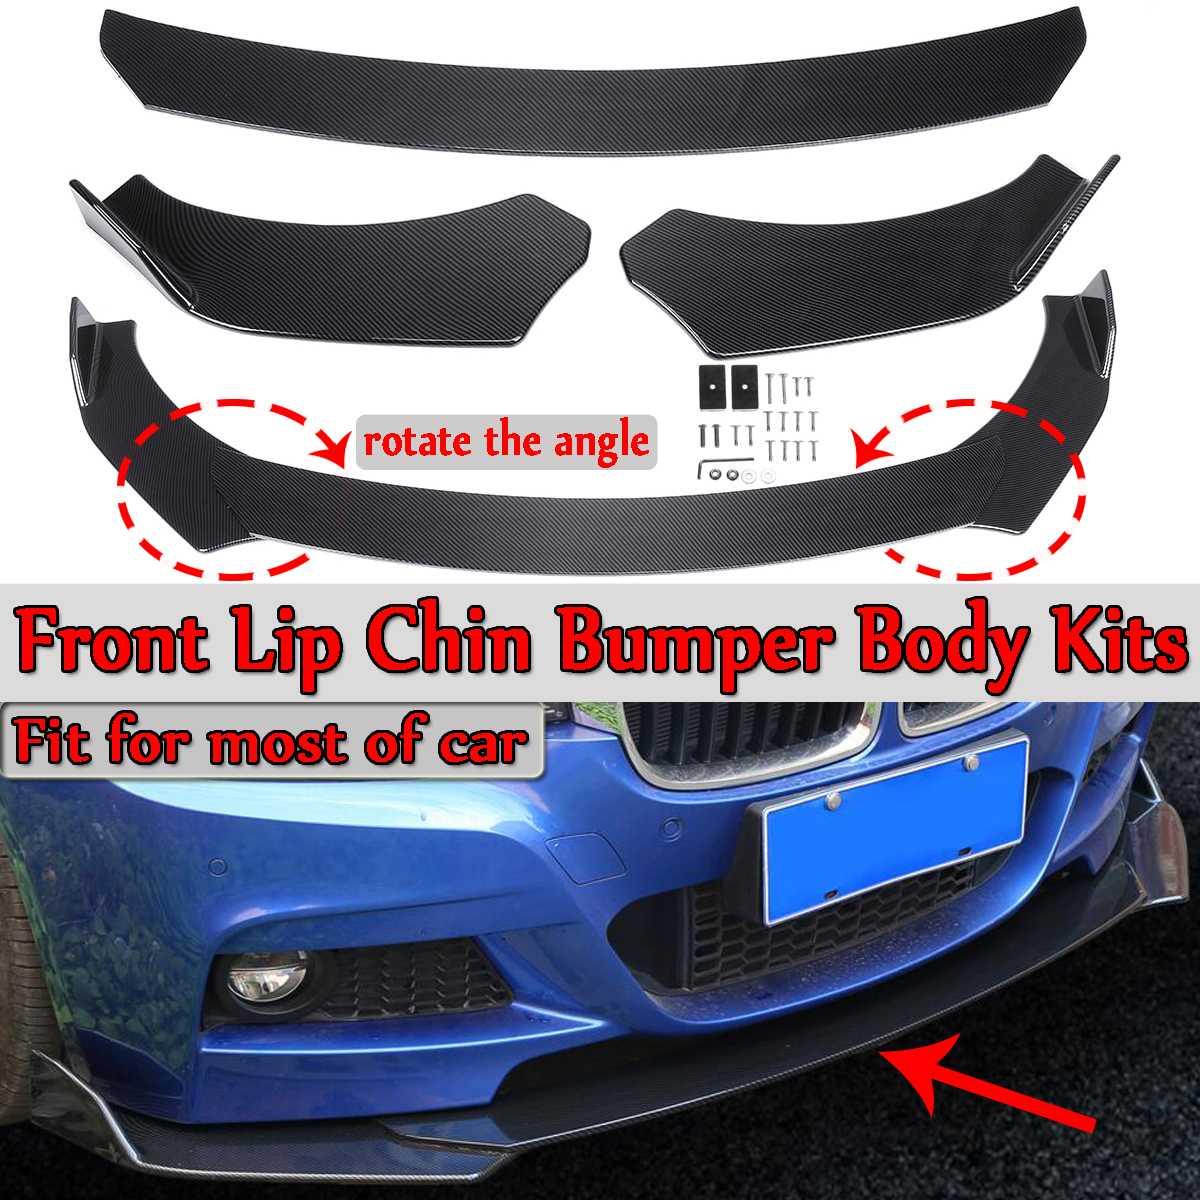 3 Piece Universal Car Front Lip Chin Bumper Splitter Diffuser Spoiler Body Kits For Honda For Audi For Benz For BMW For Subaru